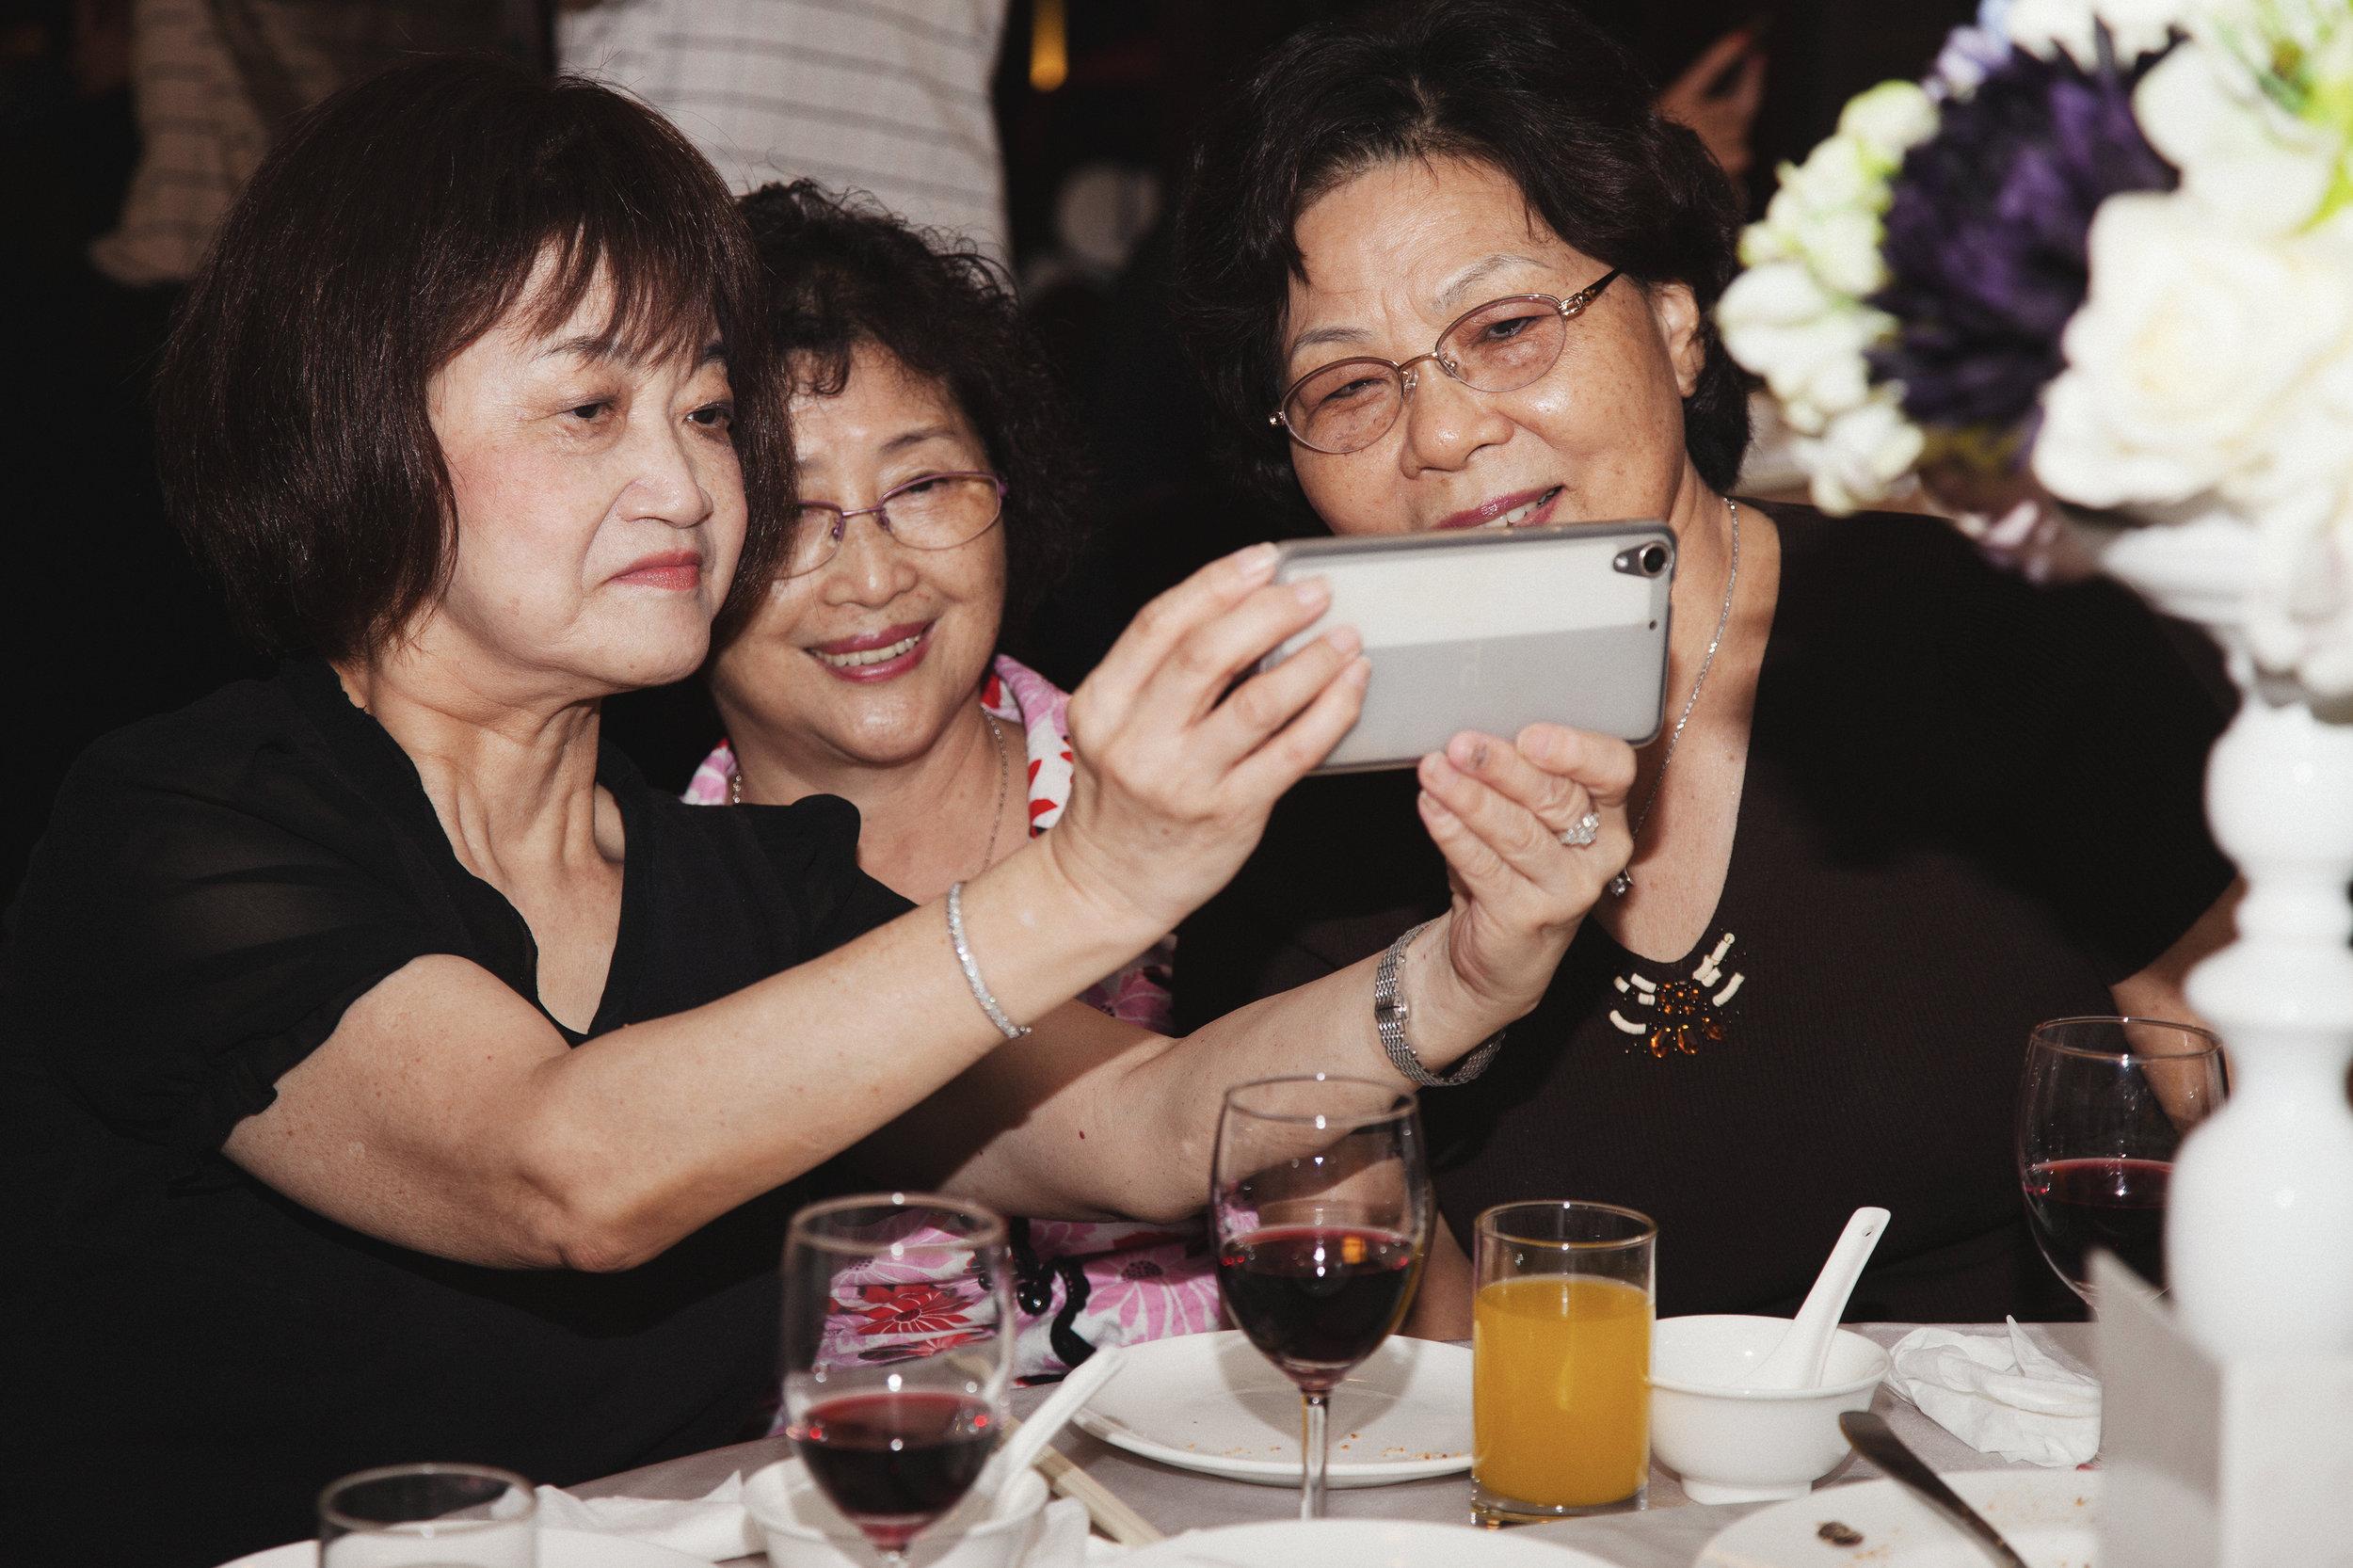 [JC]CREATIVE 女性攝影師 北投儷宴會館 補請台灣WEDDING    自然風格 台北婚攝推 女婚攝  桃園婚攝   圖像00142.JPG